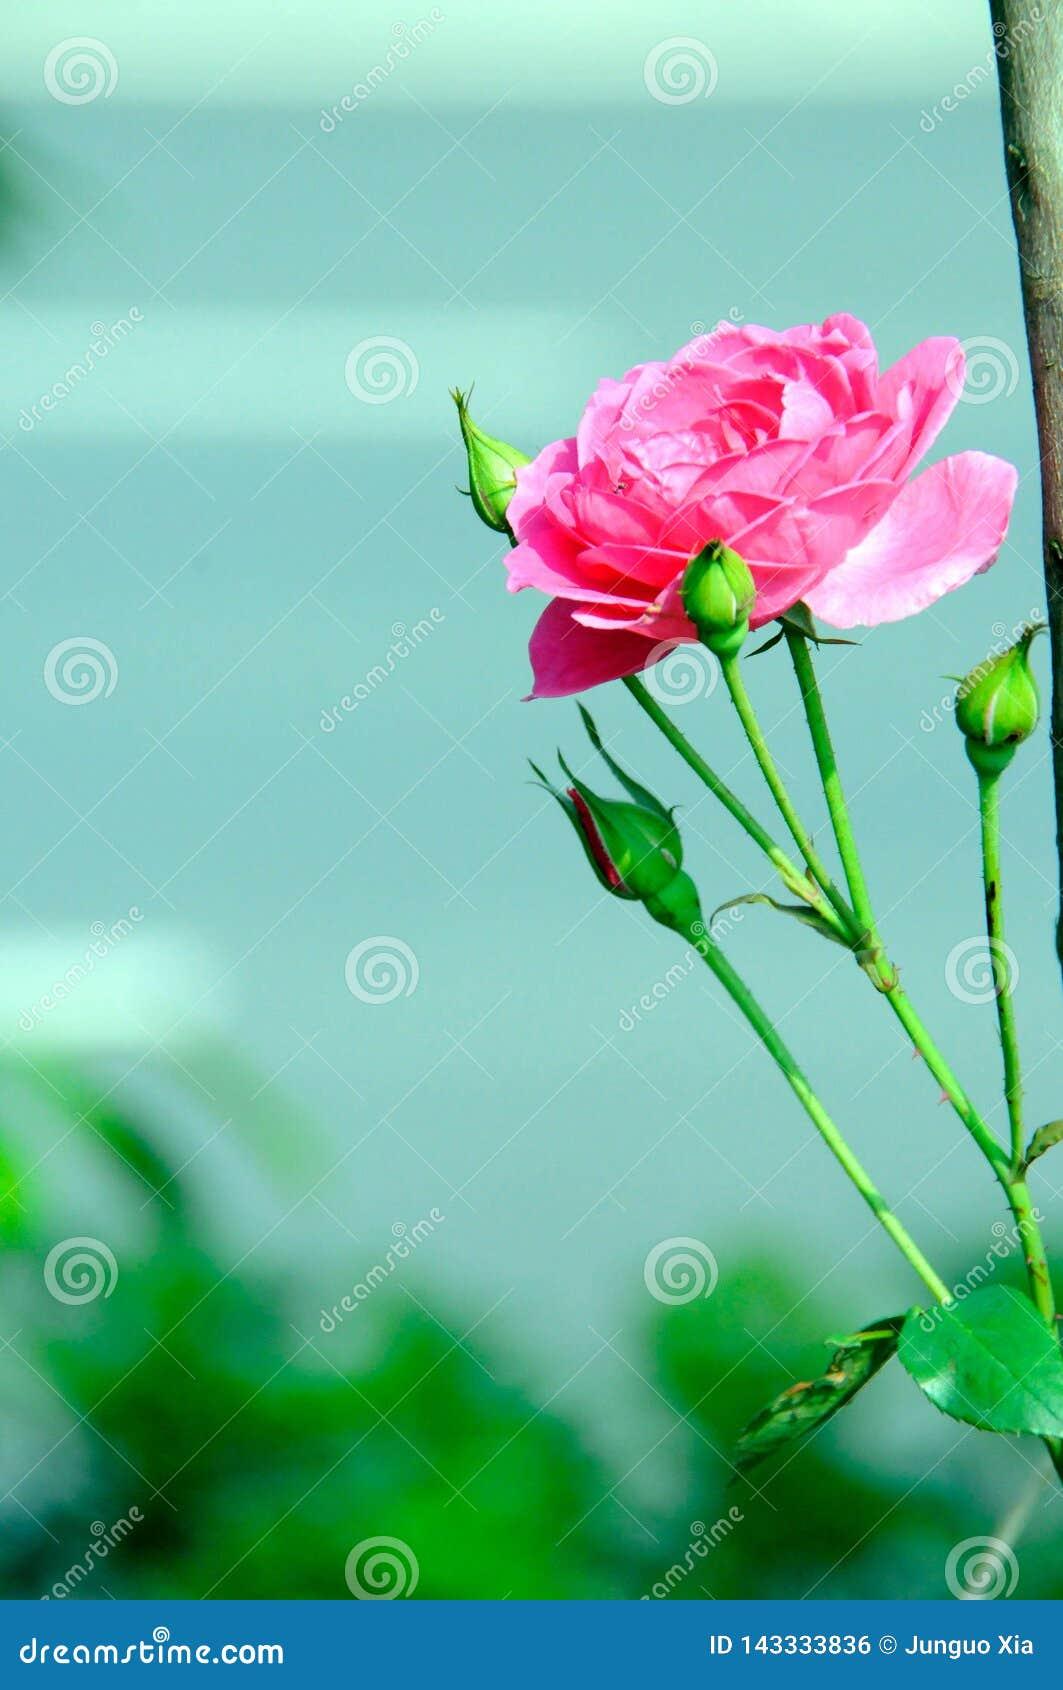 A bloomy peony flower